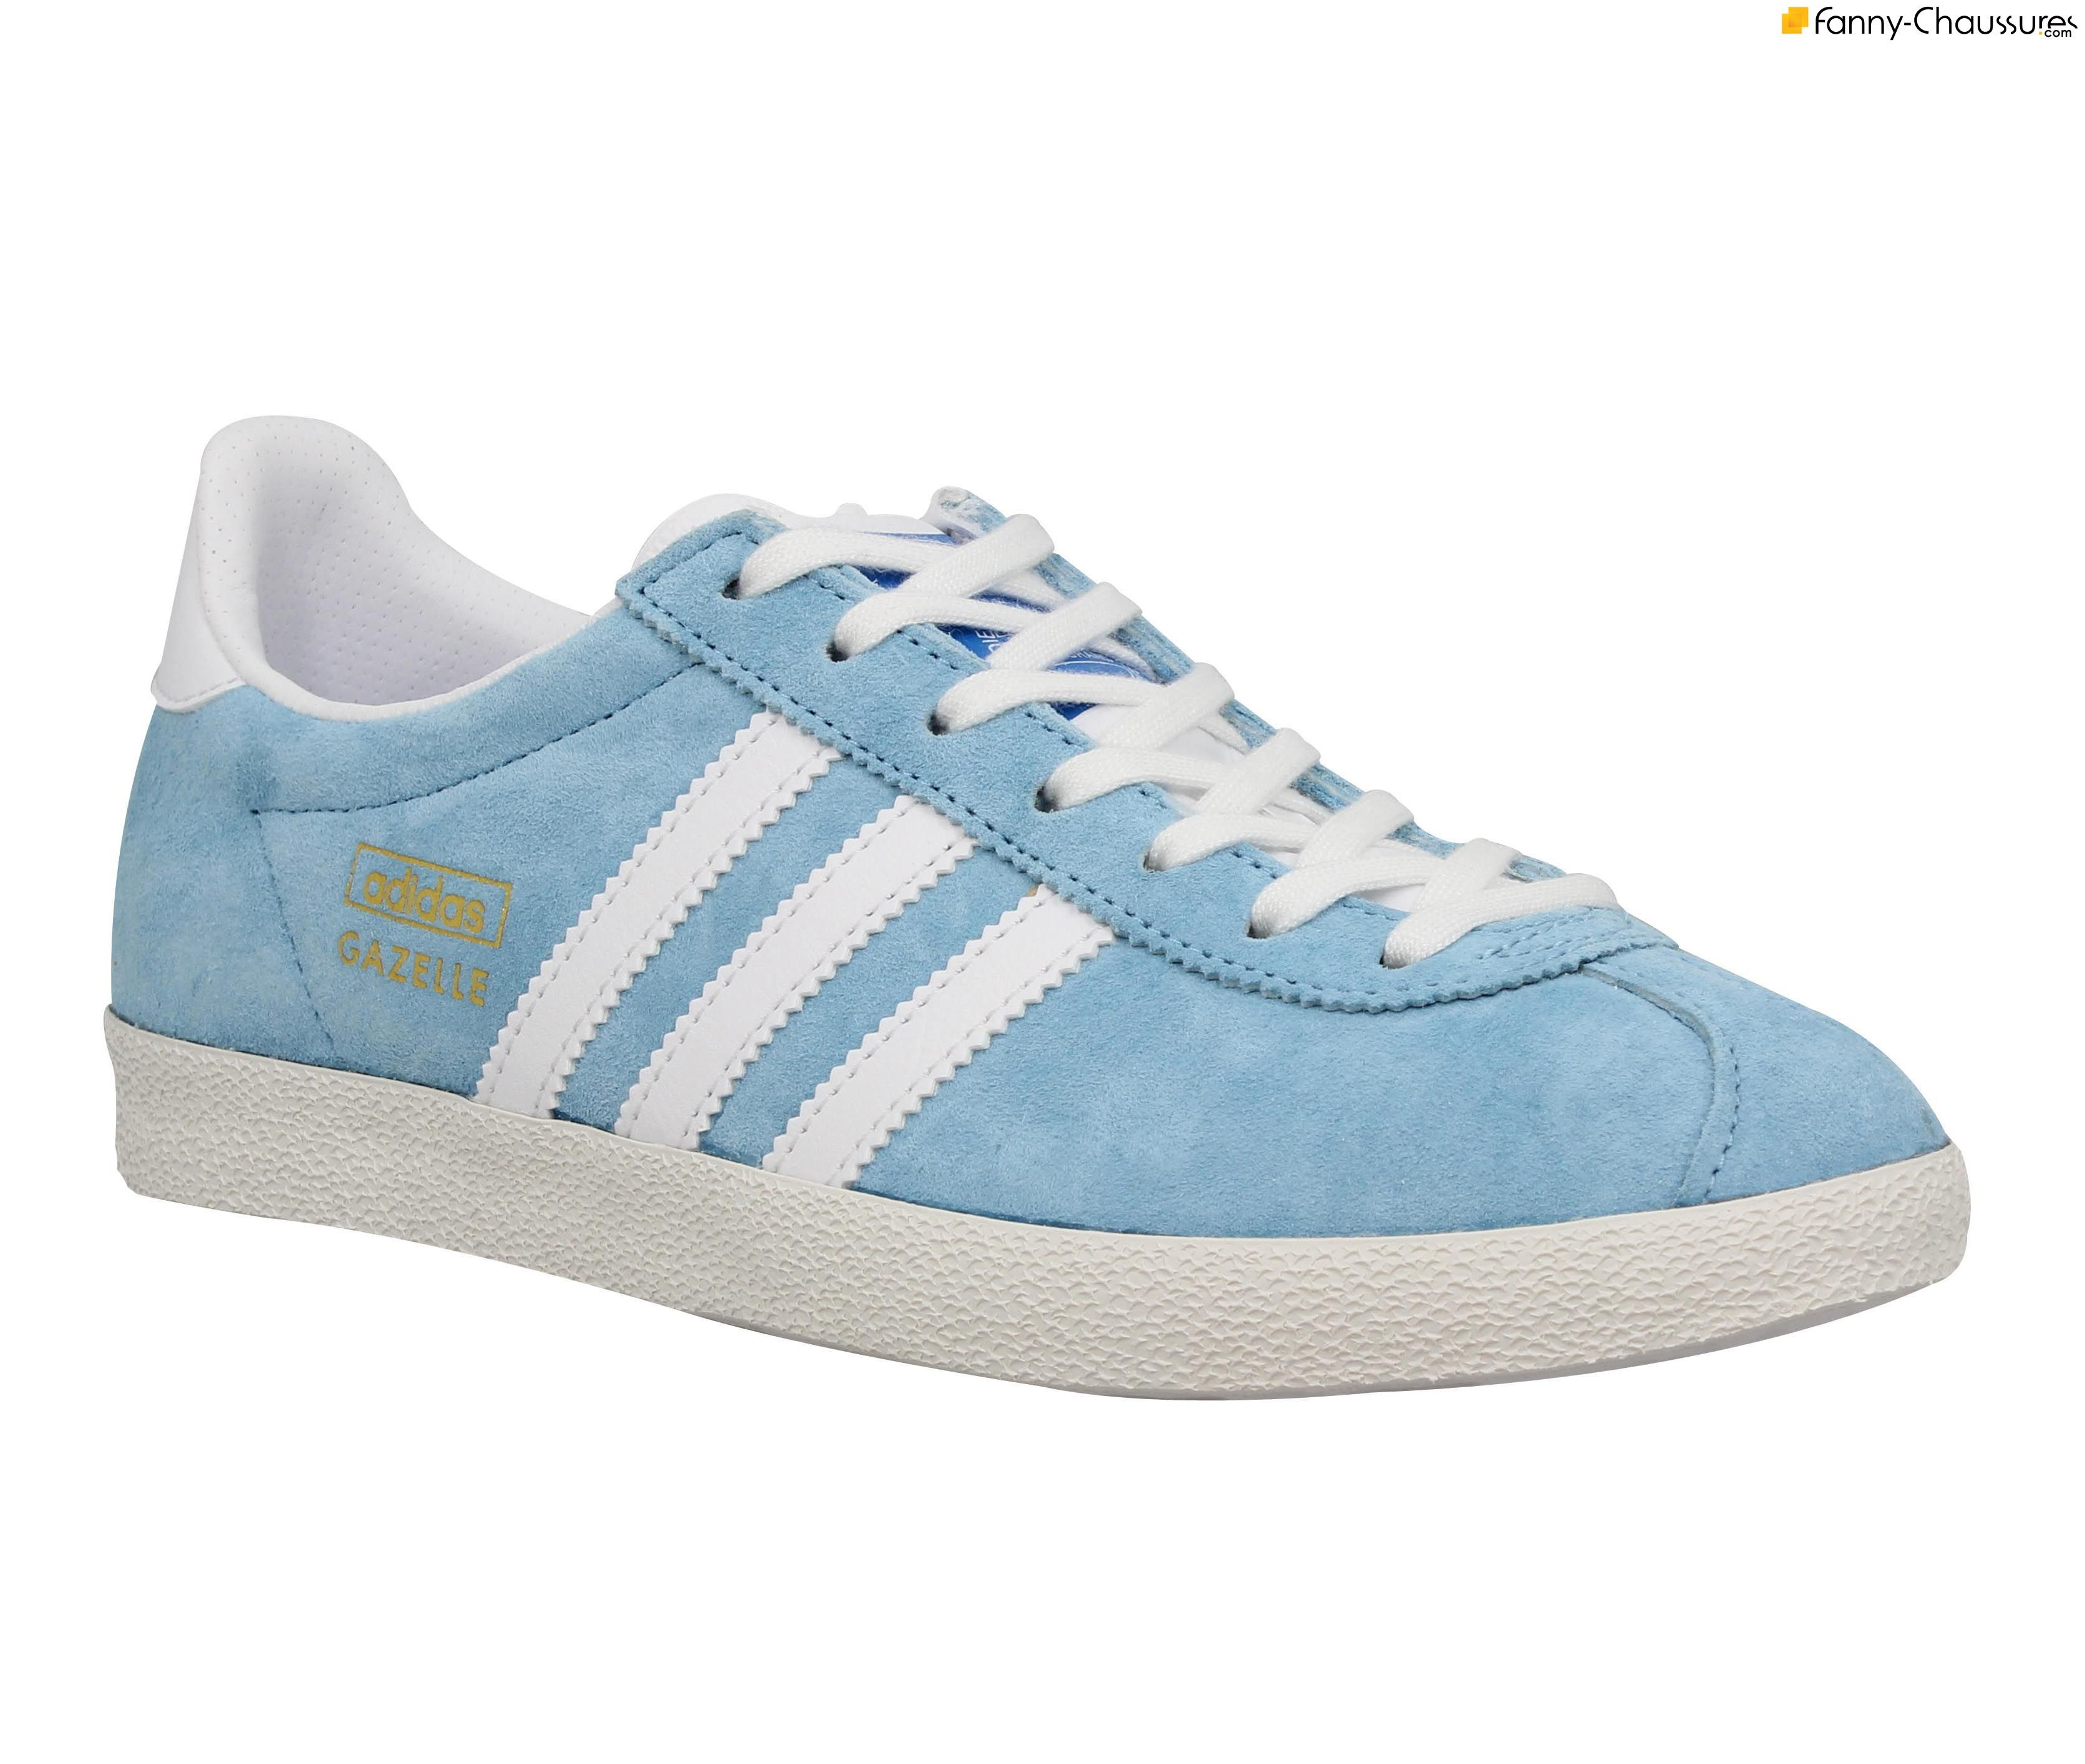 Chaussures Adidas Gazelle 7